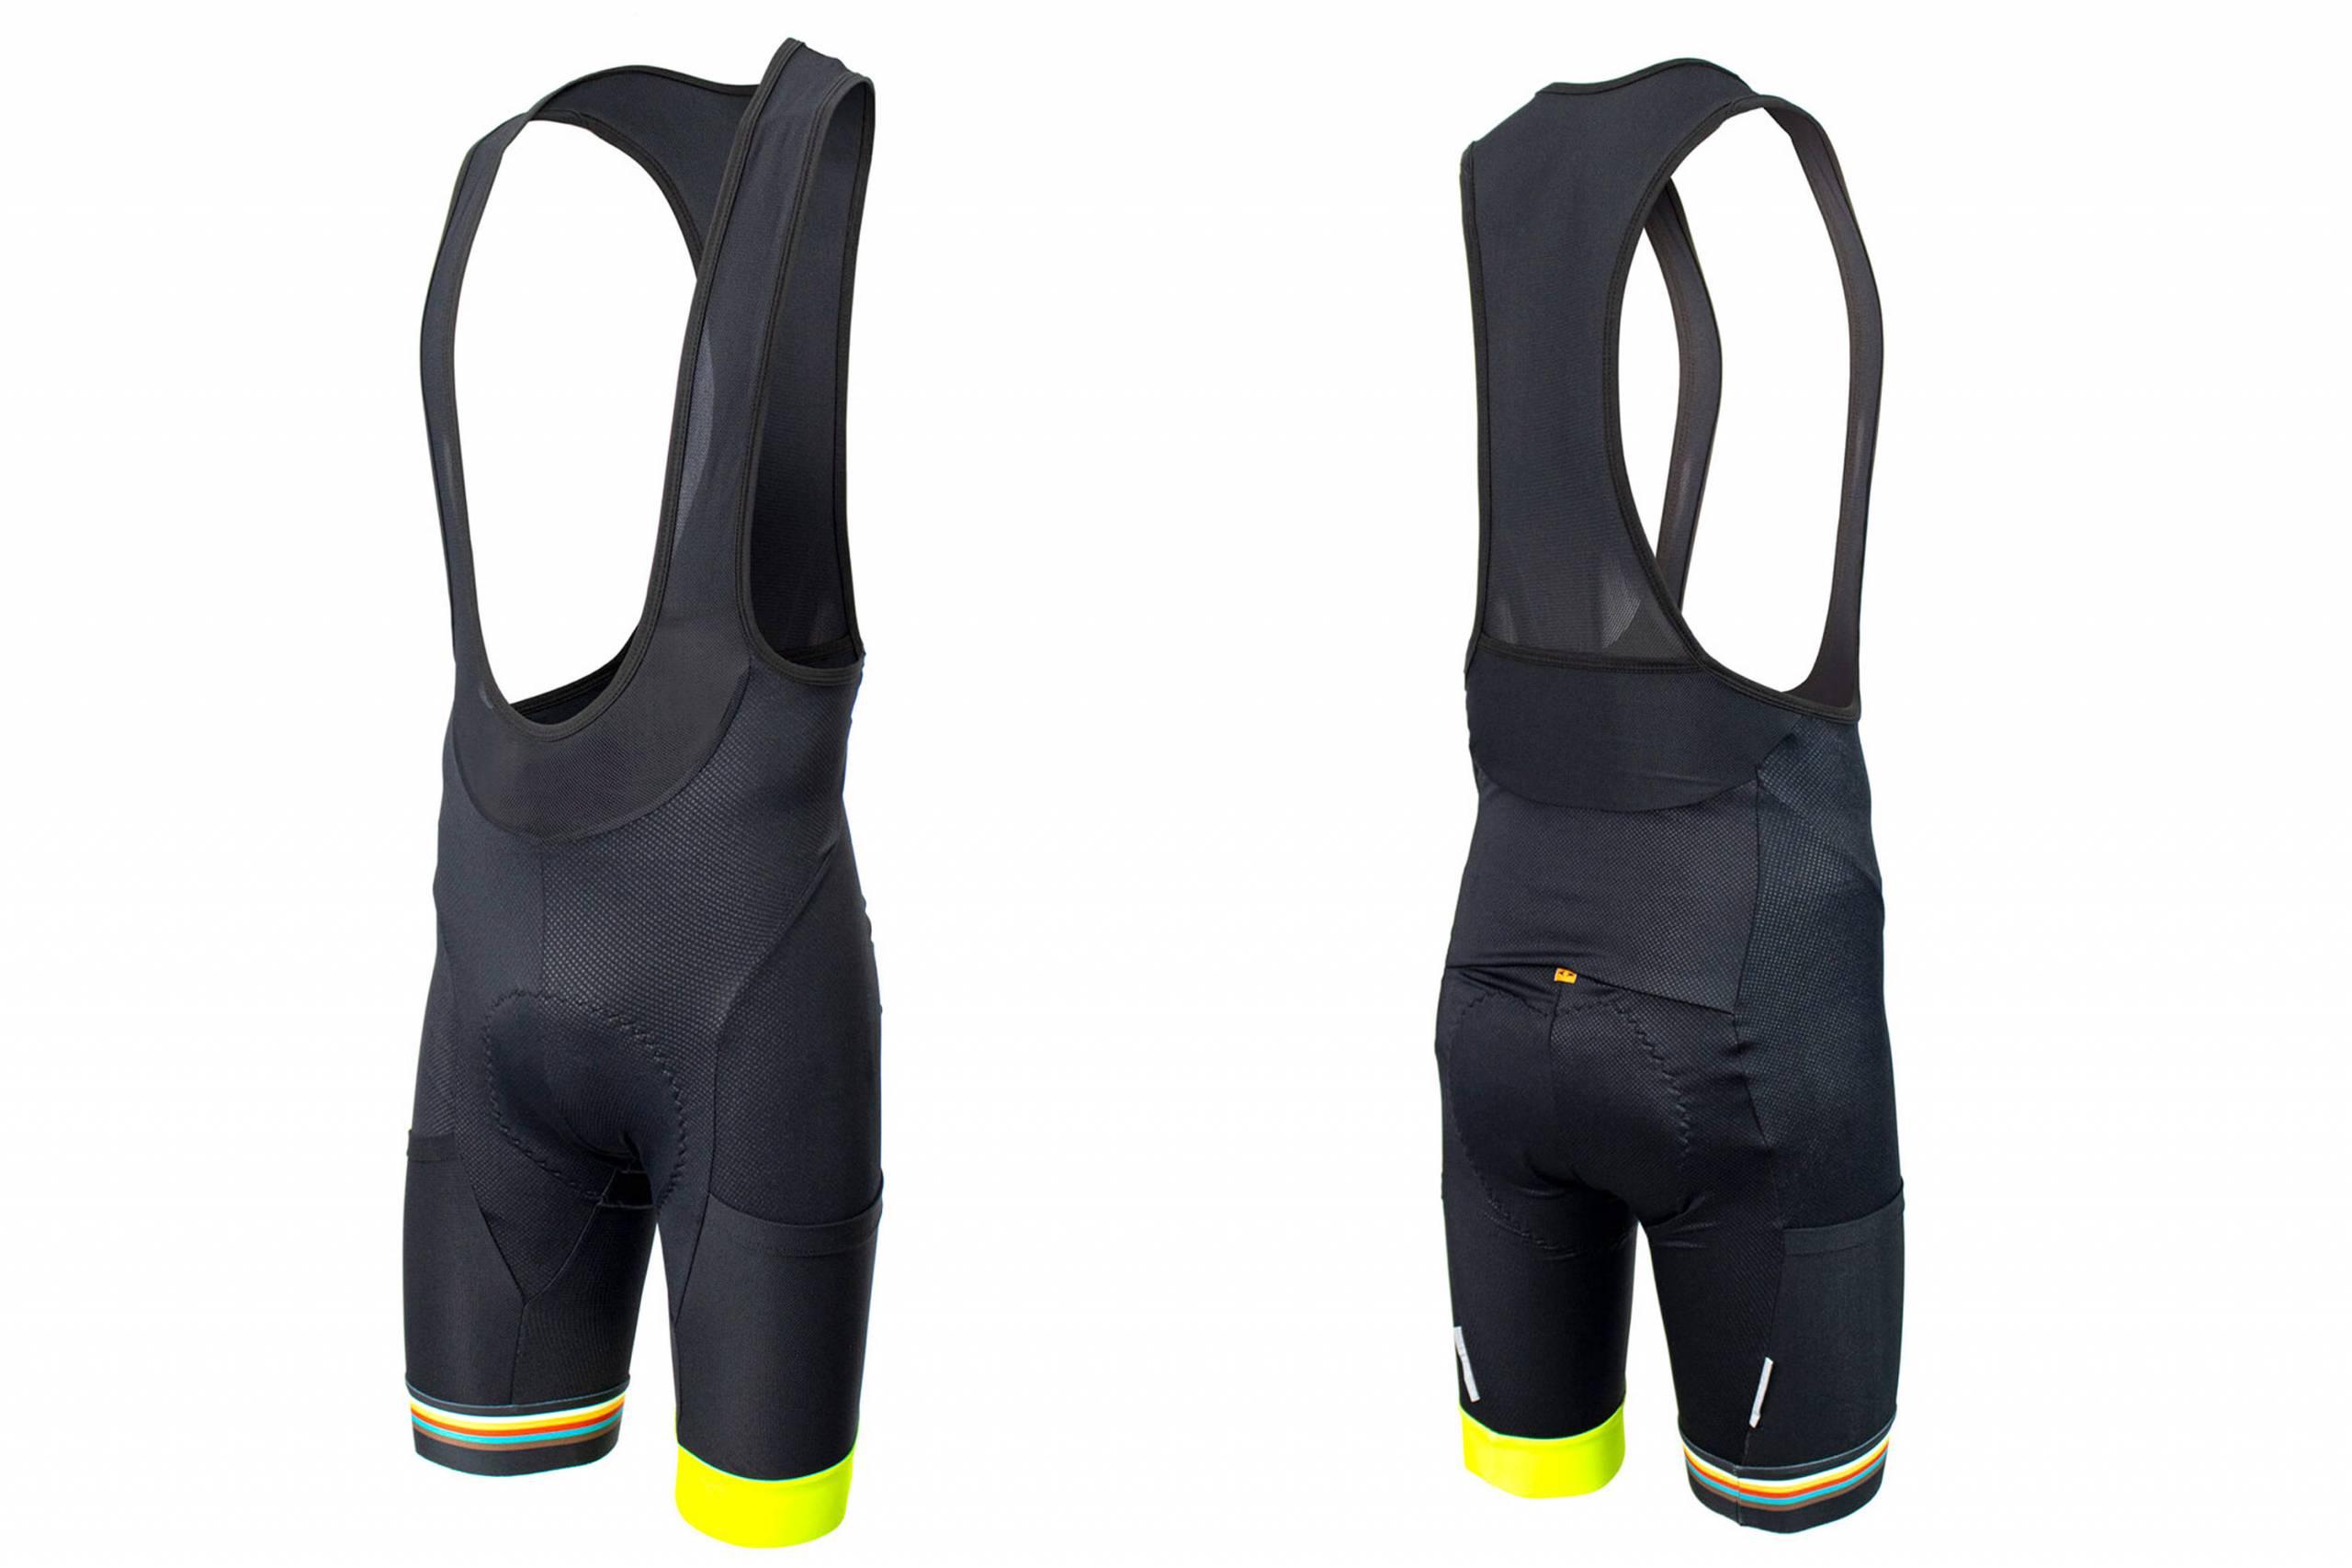 GearJunkie_Best_Bib_shorts_2021_Borah_Spring_High_Noon_OTW_Cargo_Bib_Short